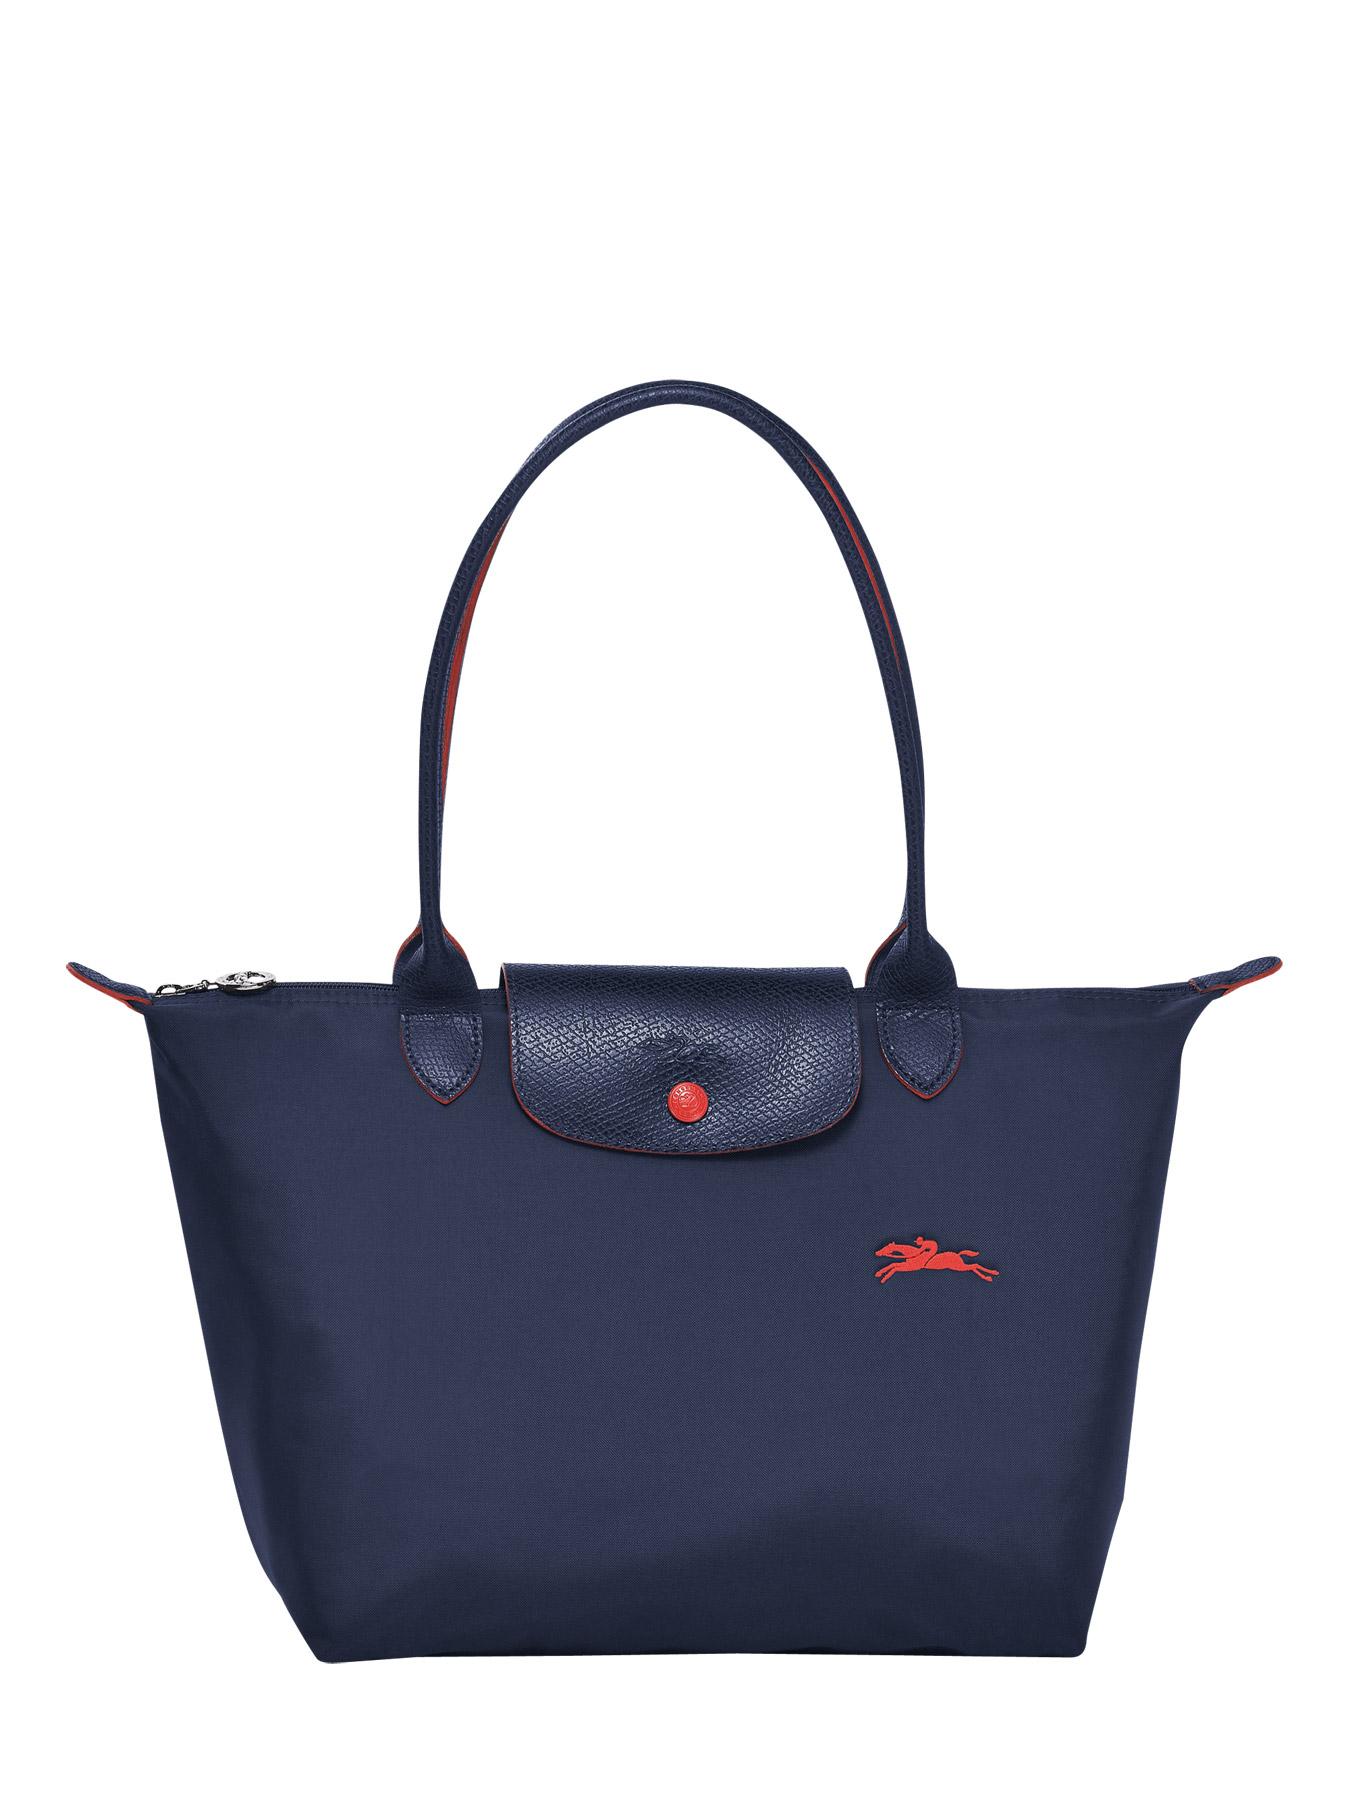 Sac shopping S Le pliage club LONGCHAMP